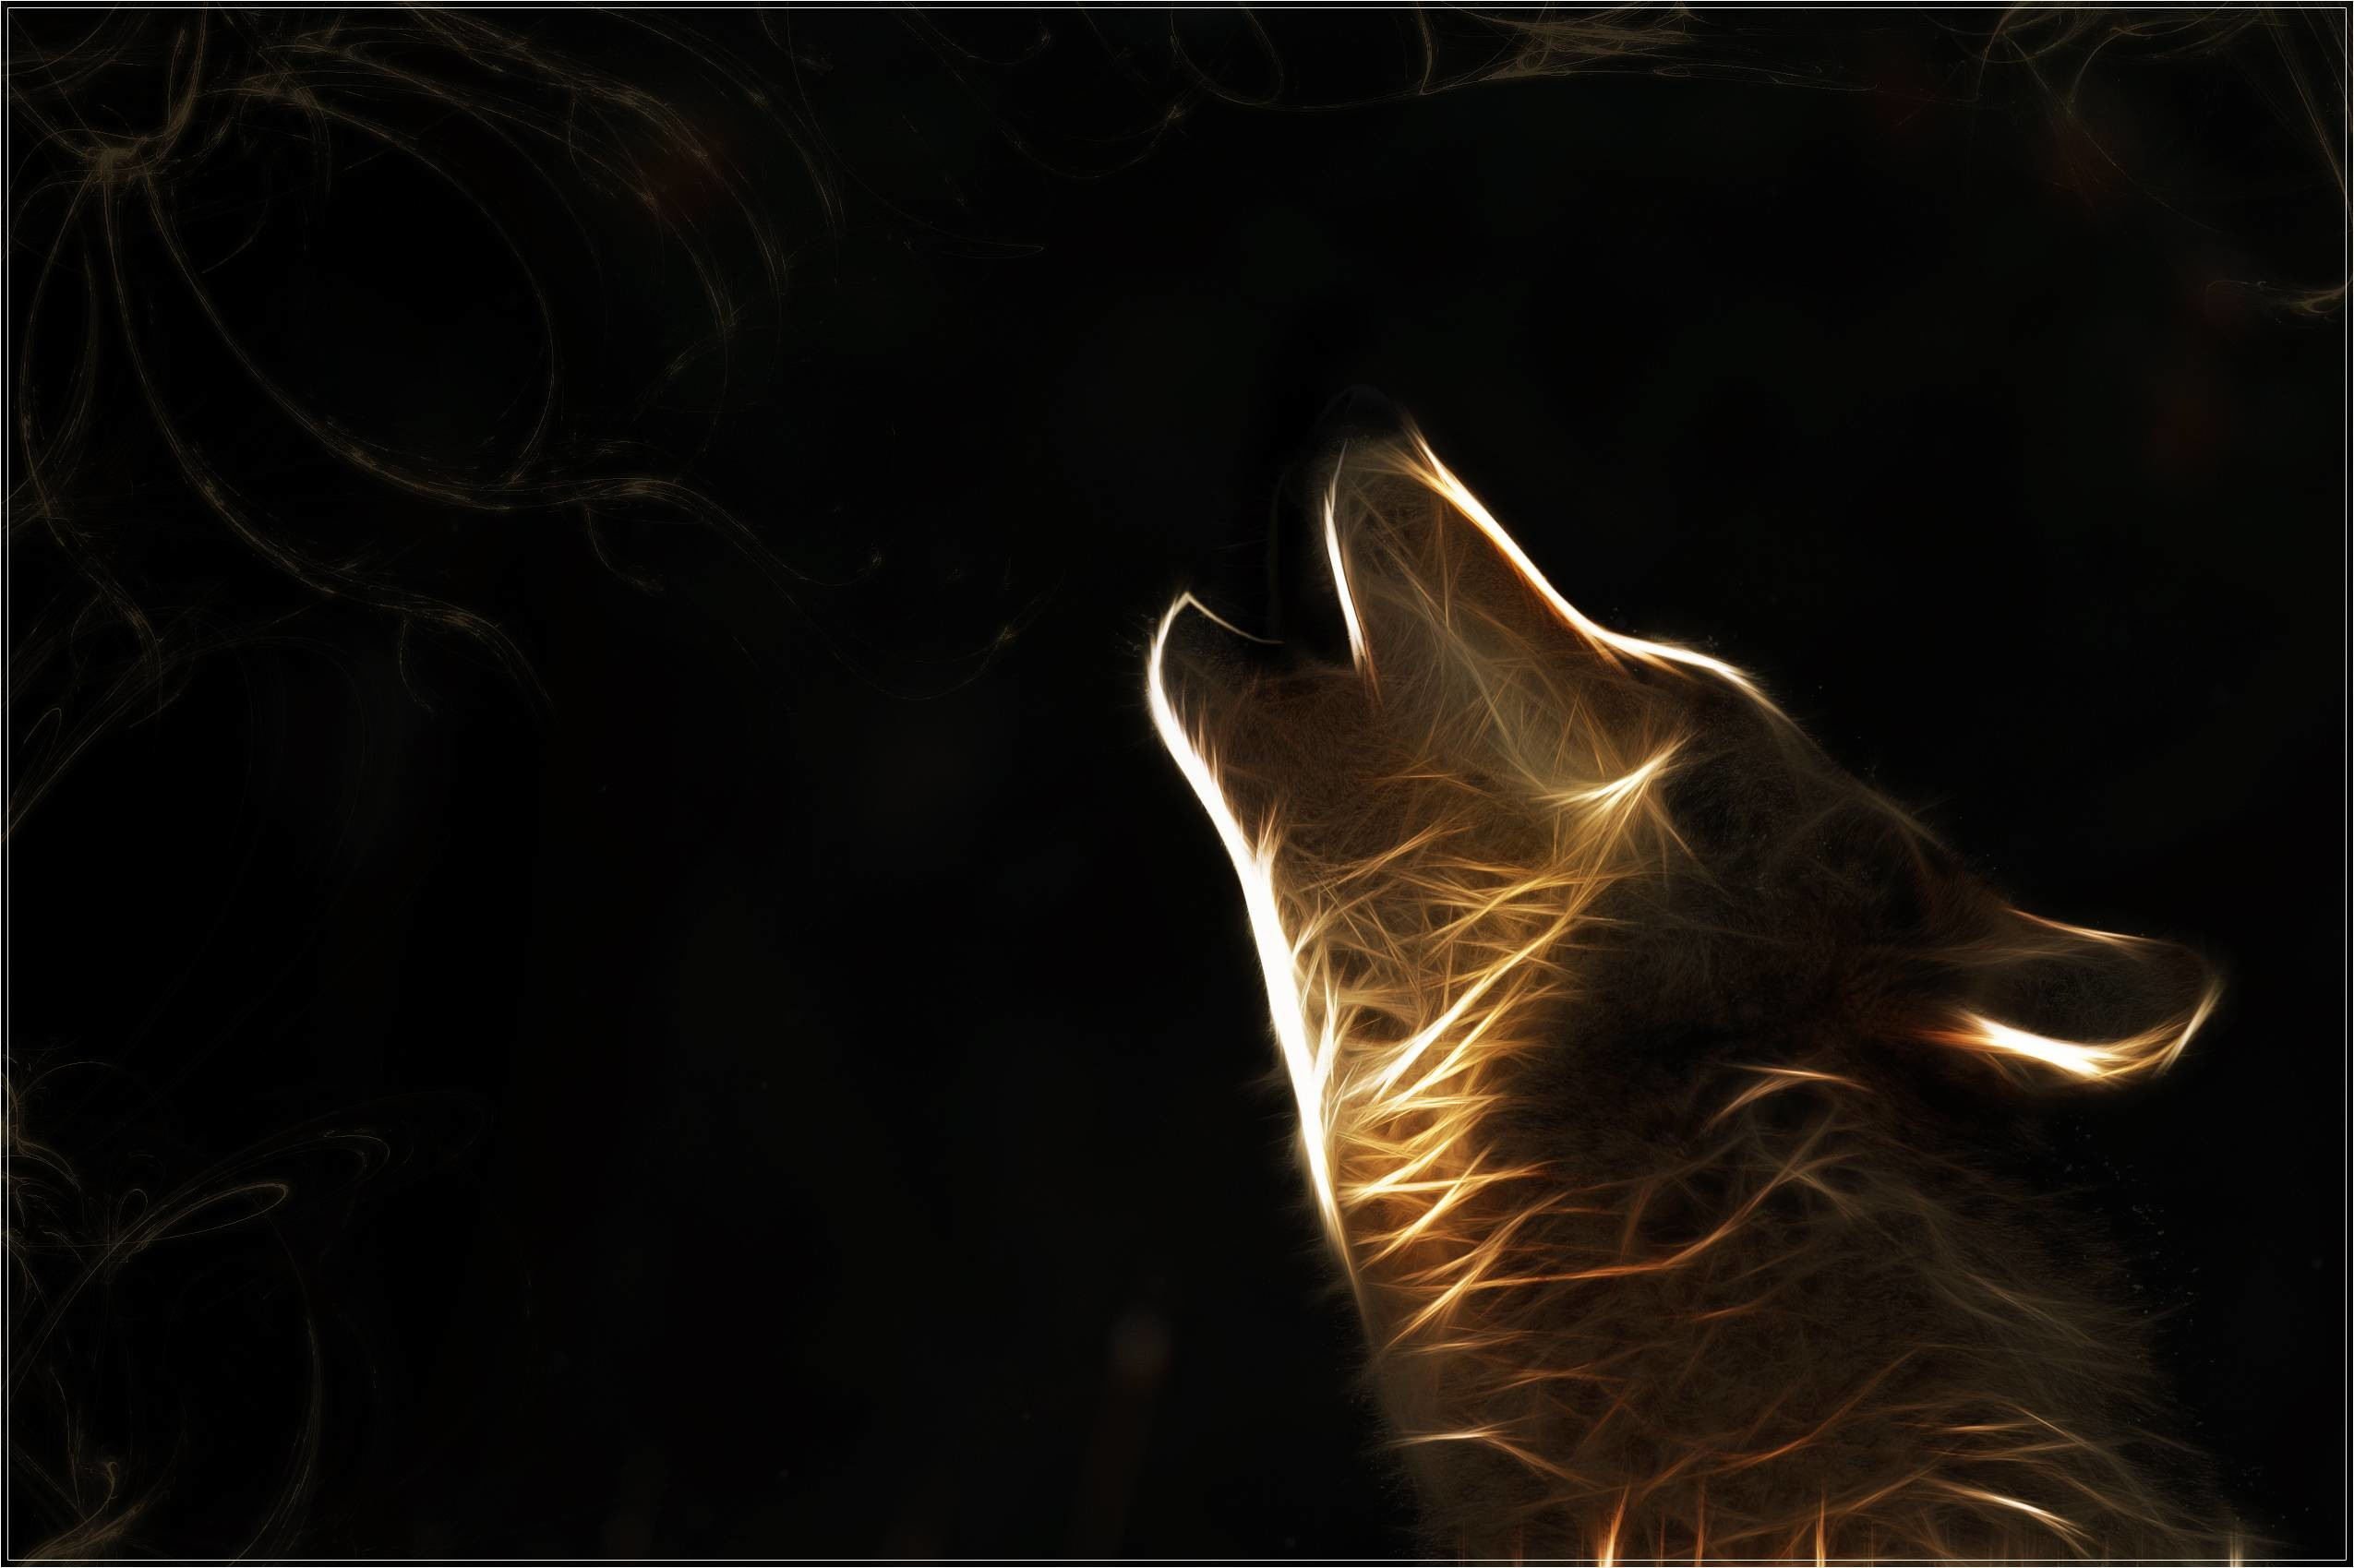 hd-wallpapers-wolf-6   dpjunk.